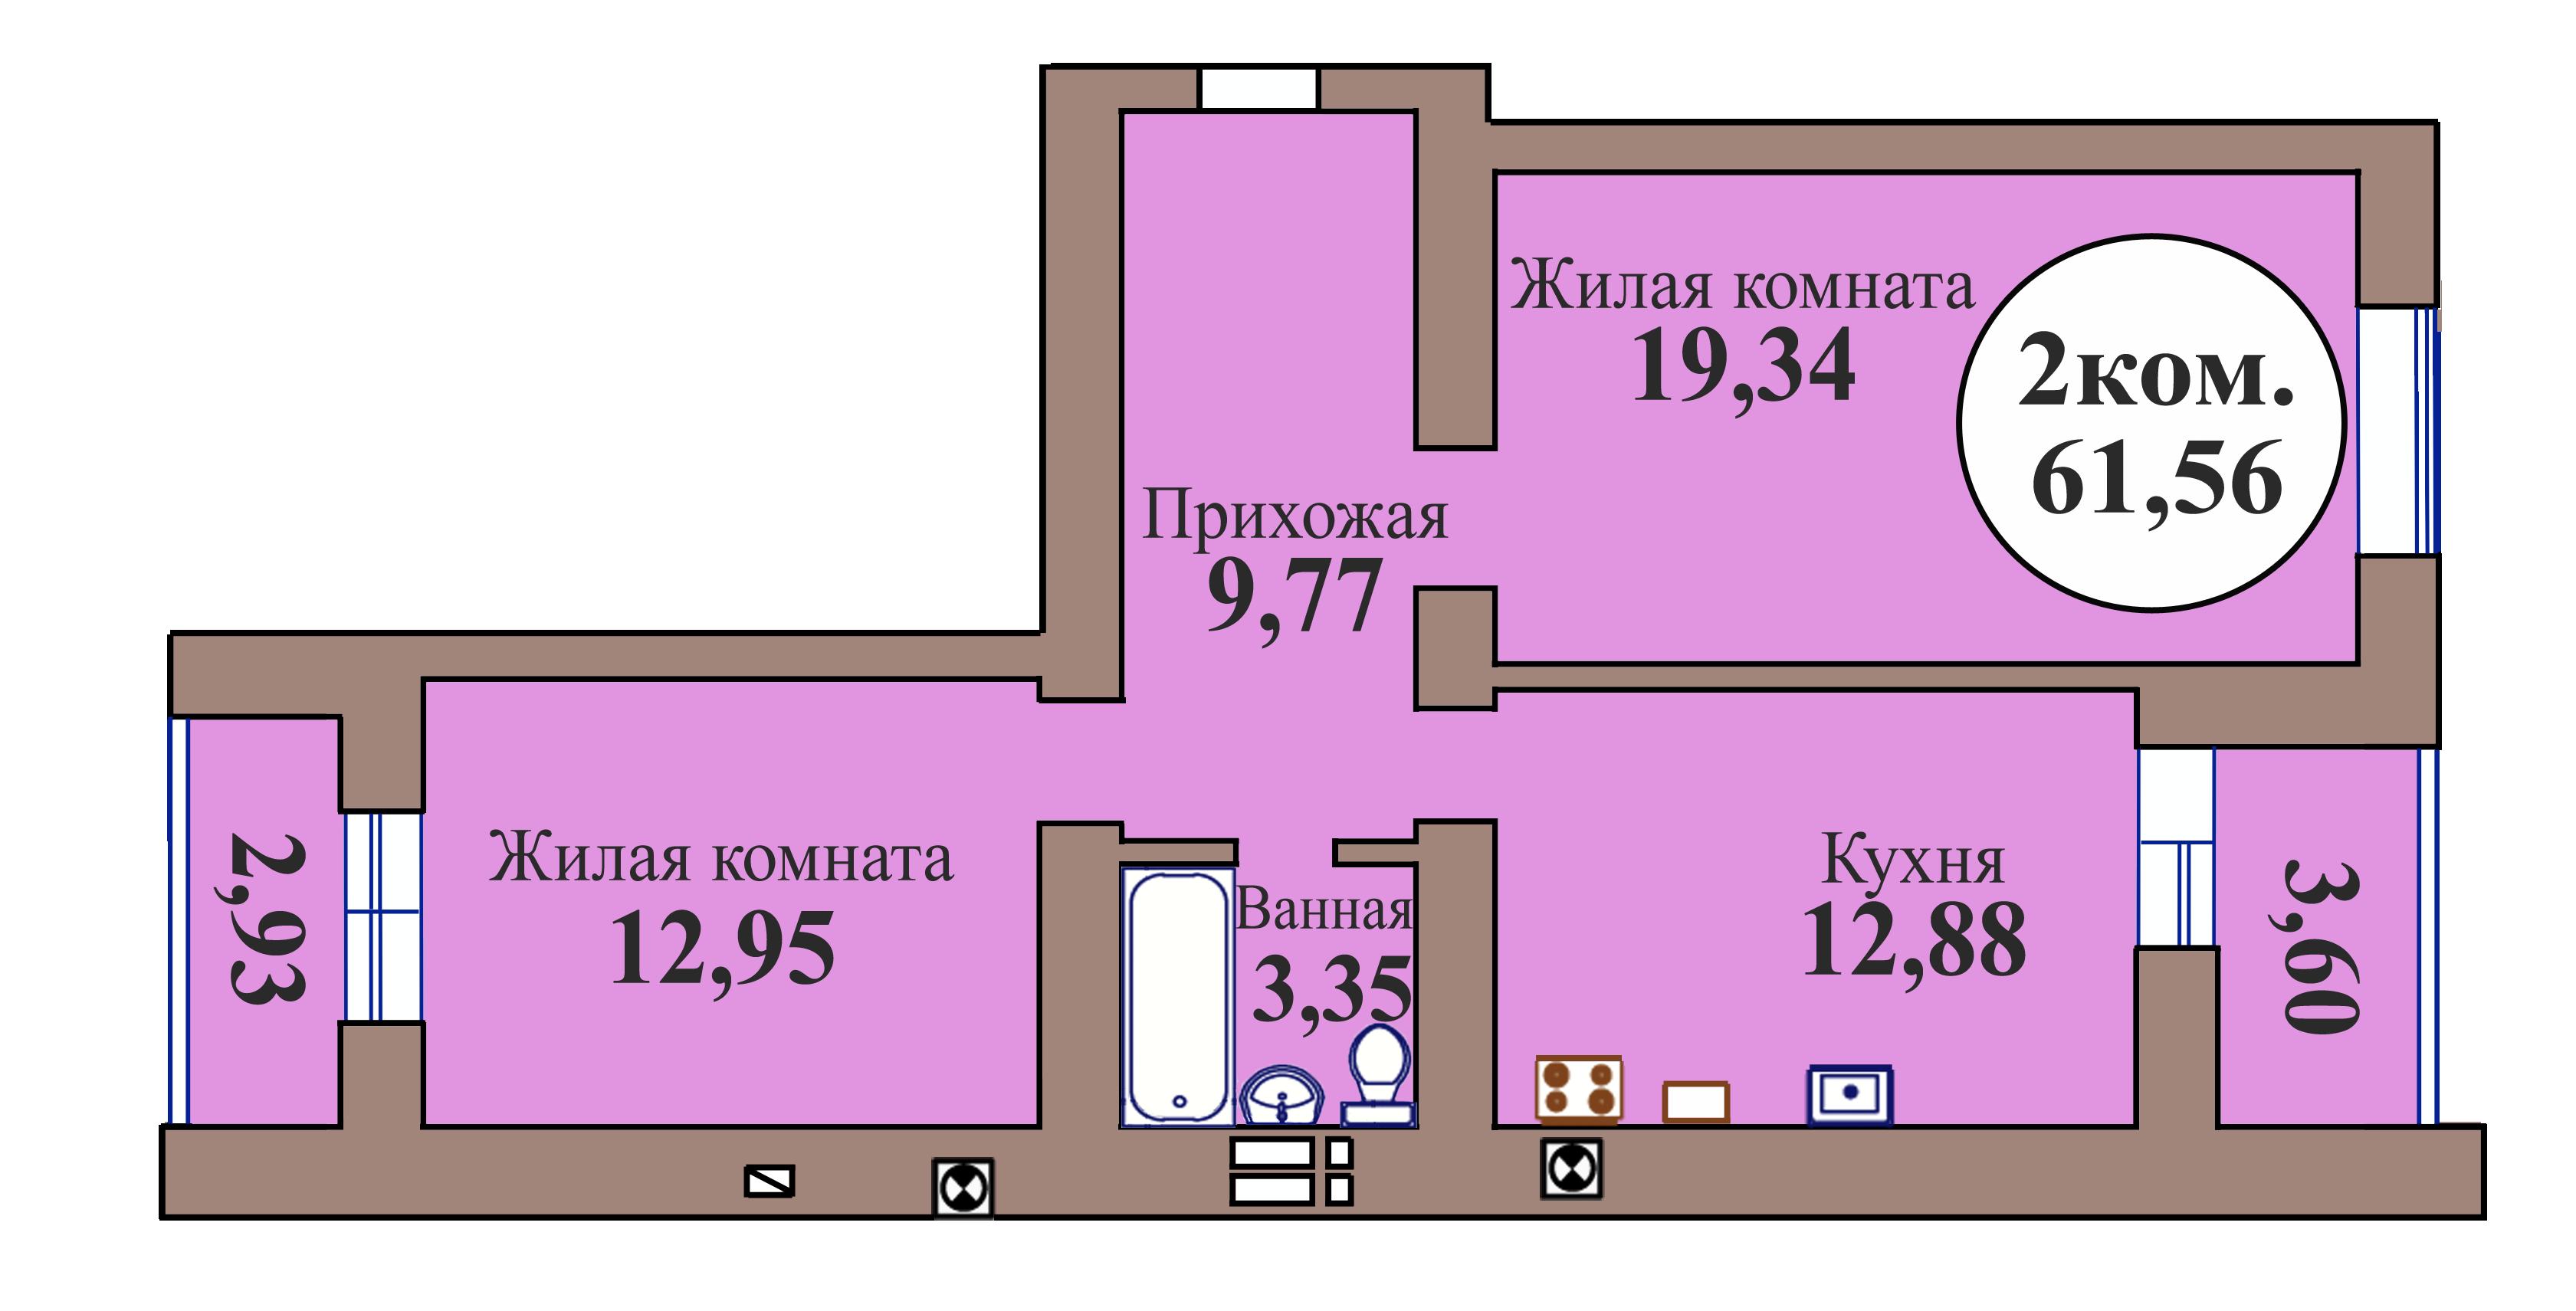 2-комн. кв. по пер. Калининградский, 5 кв. 131 в Калининграде